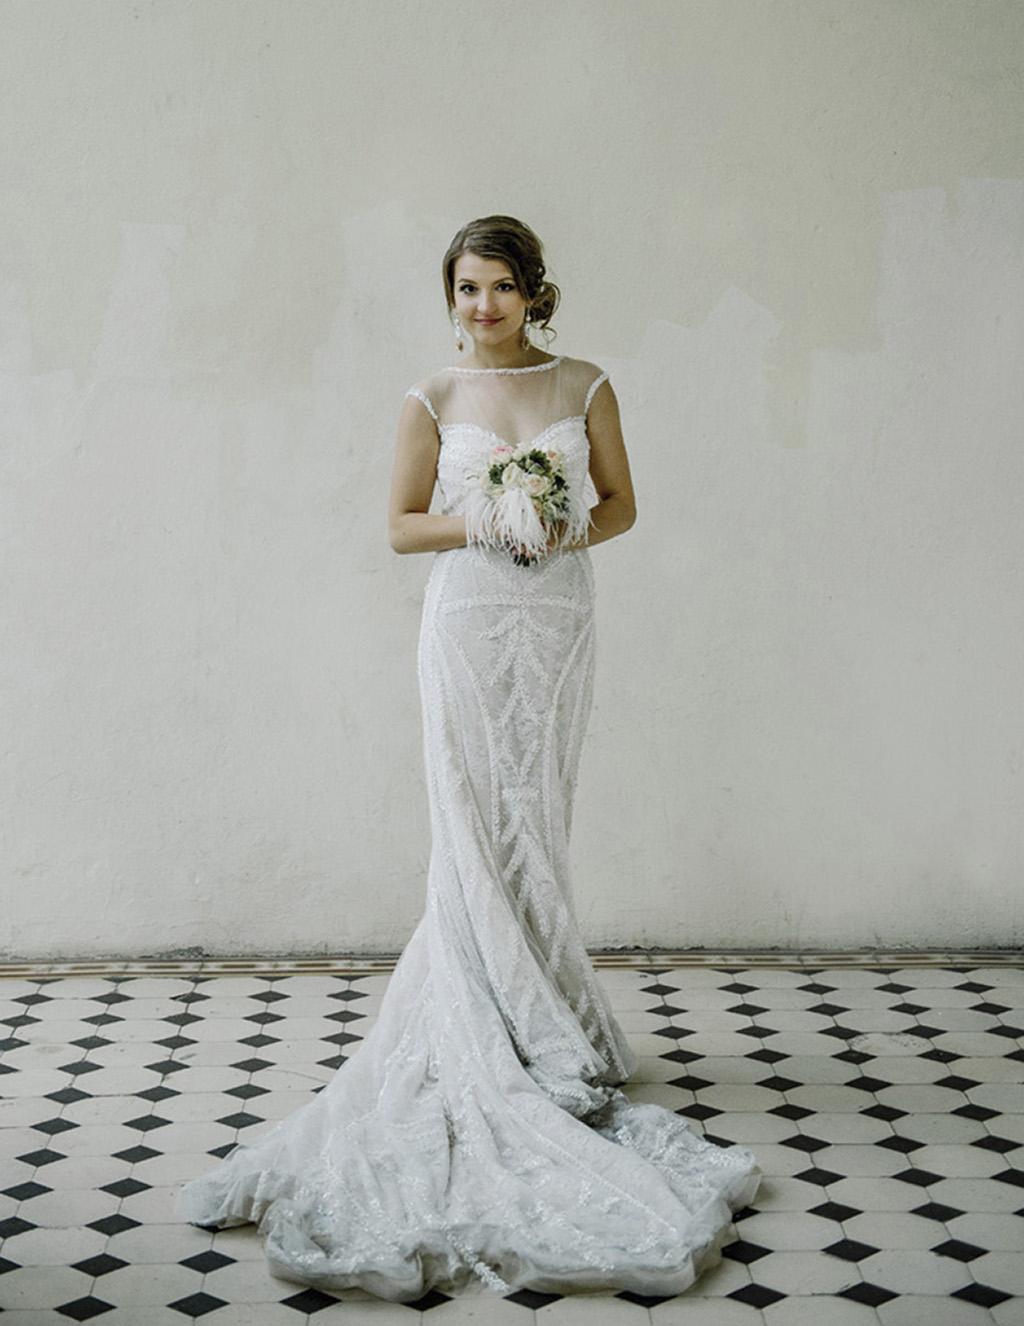 2014 aiduke photography brides 041